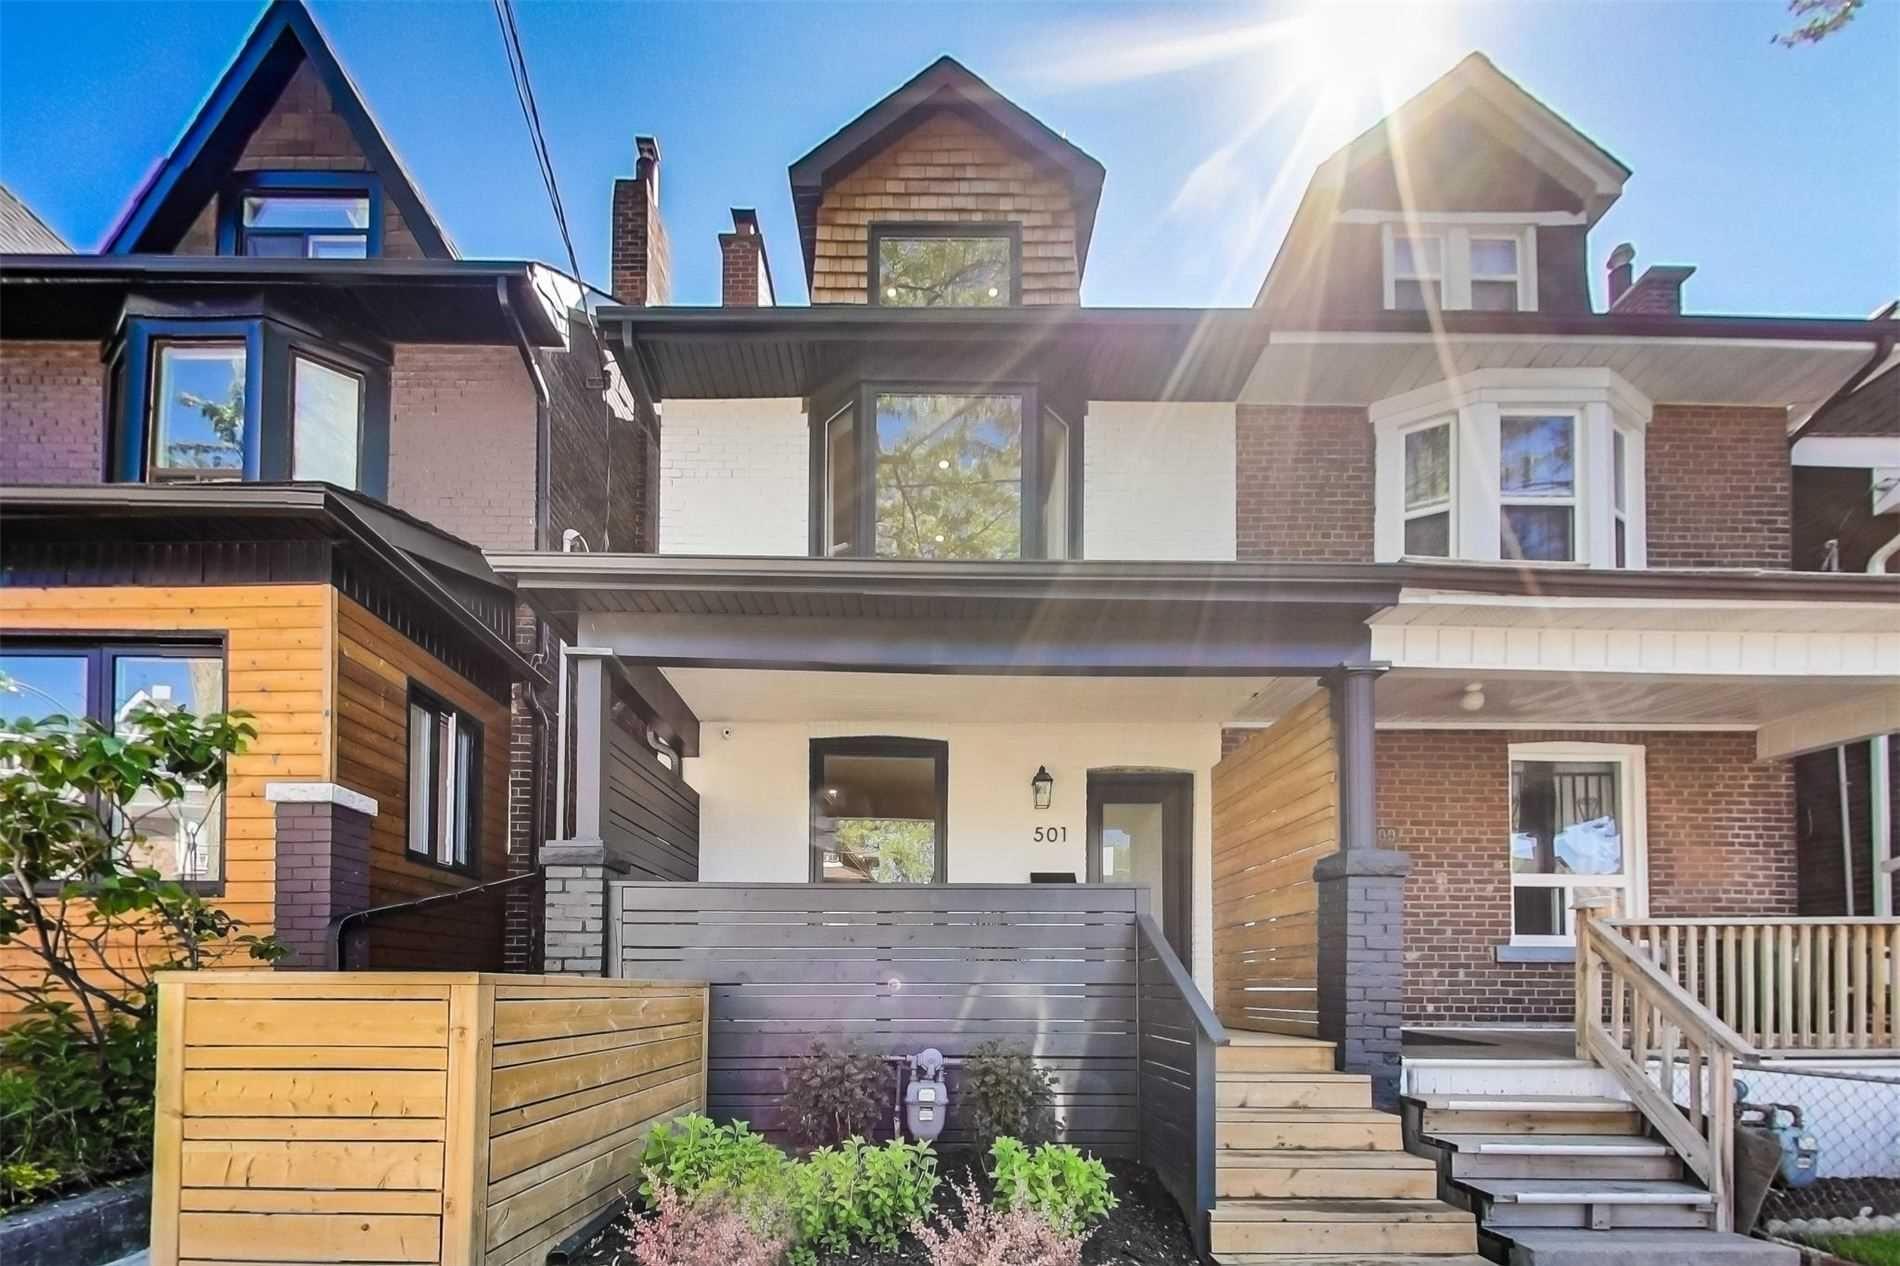 Photo 15: Photos: 501B Carlaw Avenue in Toronto: South Riverdale House (2 1/2 Storey) for lease (Toronto E01)  : MLS®# E4800704